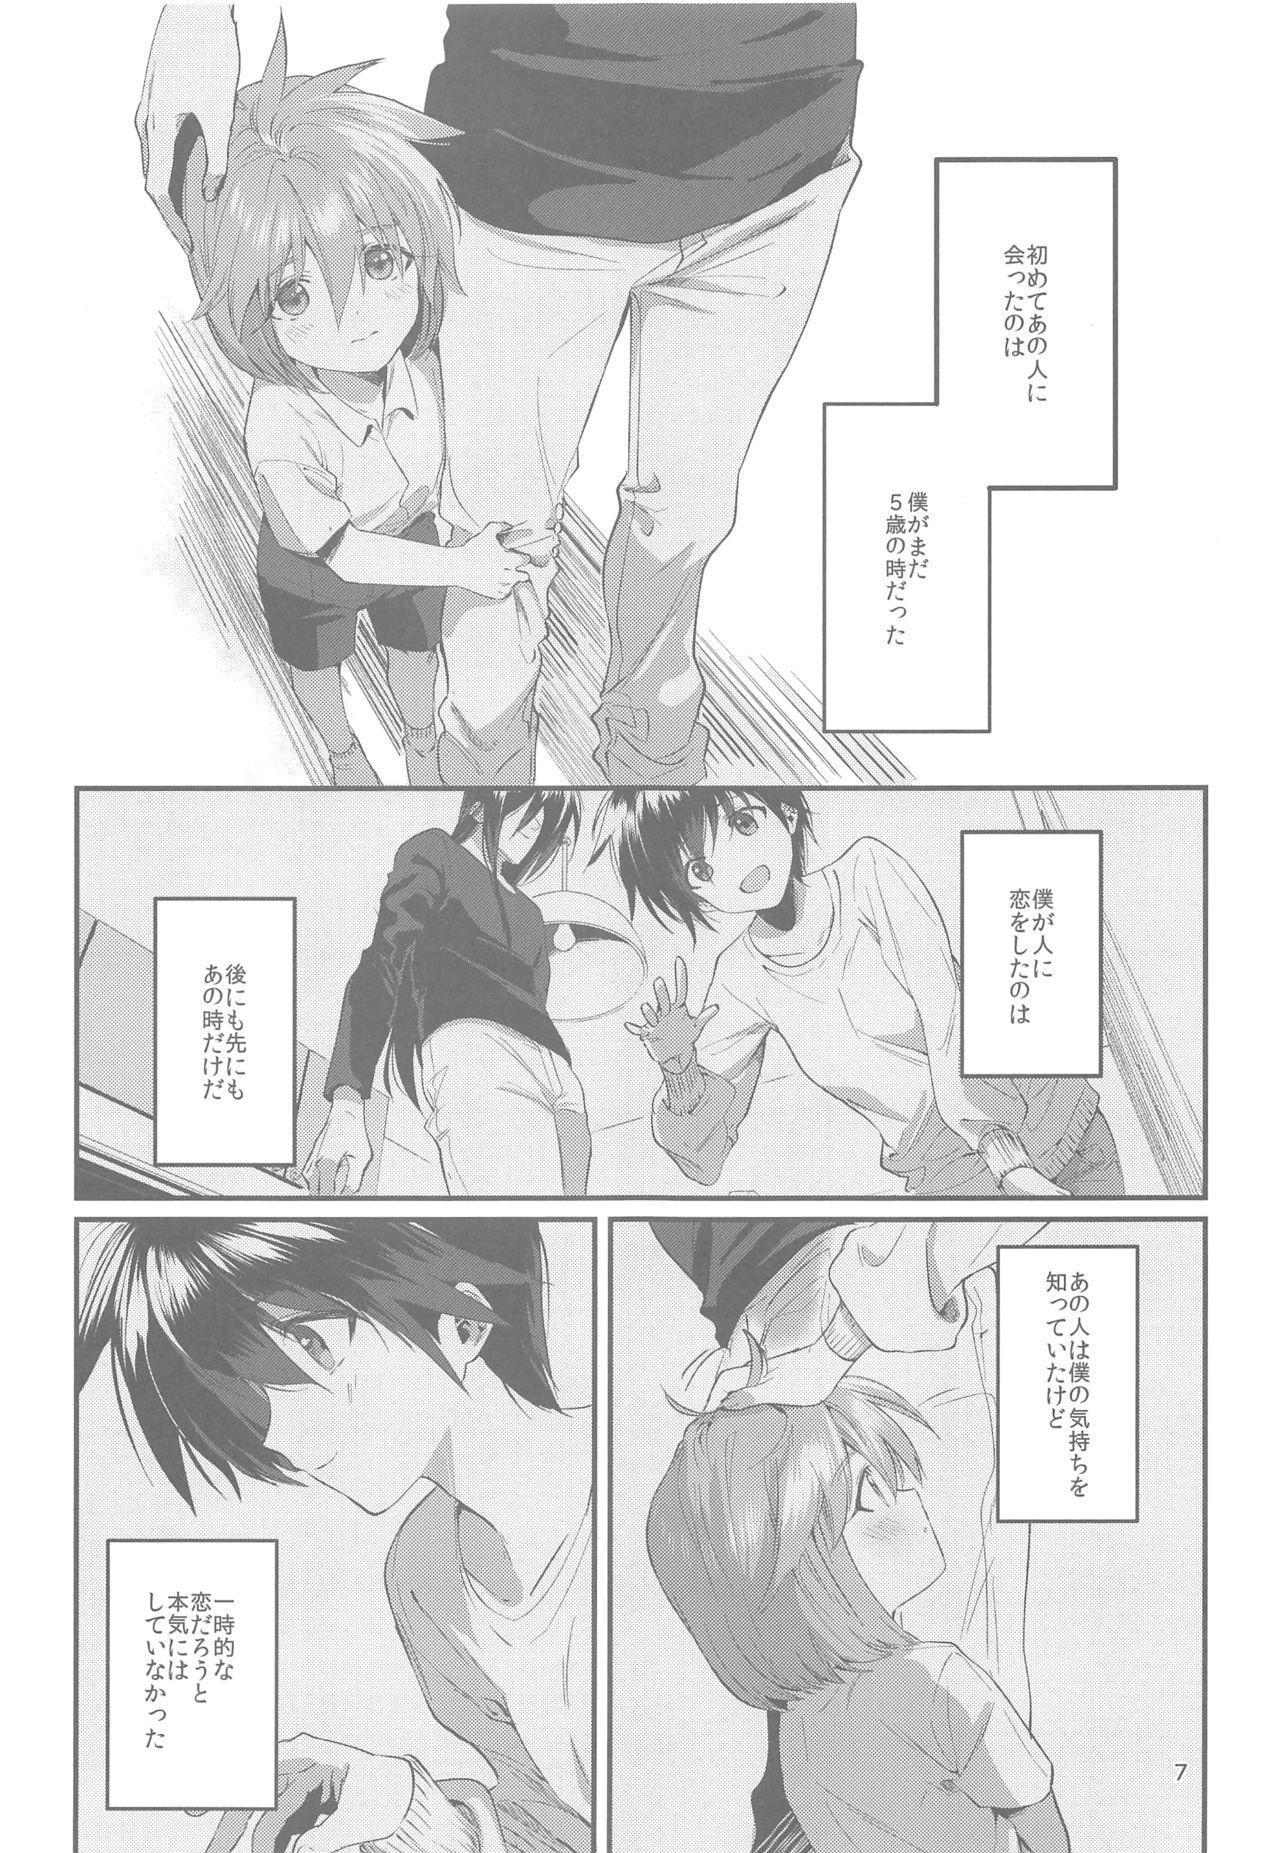 Anata ni Deaeta Shiawase ni 5